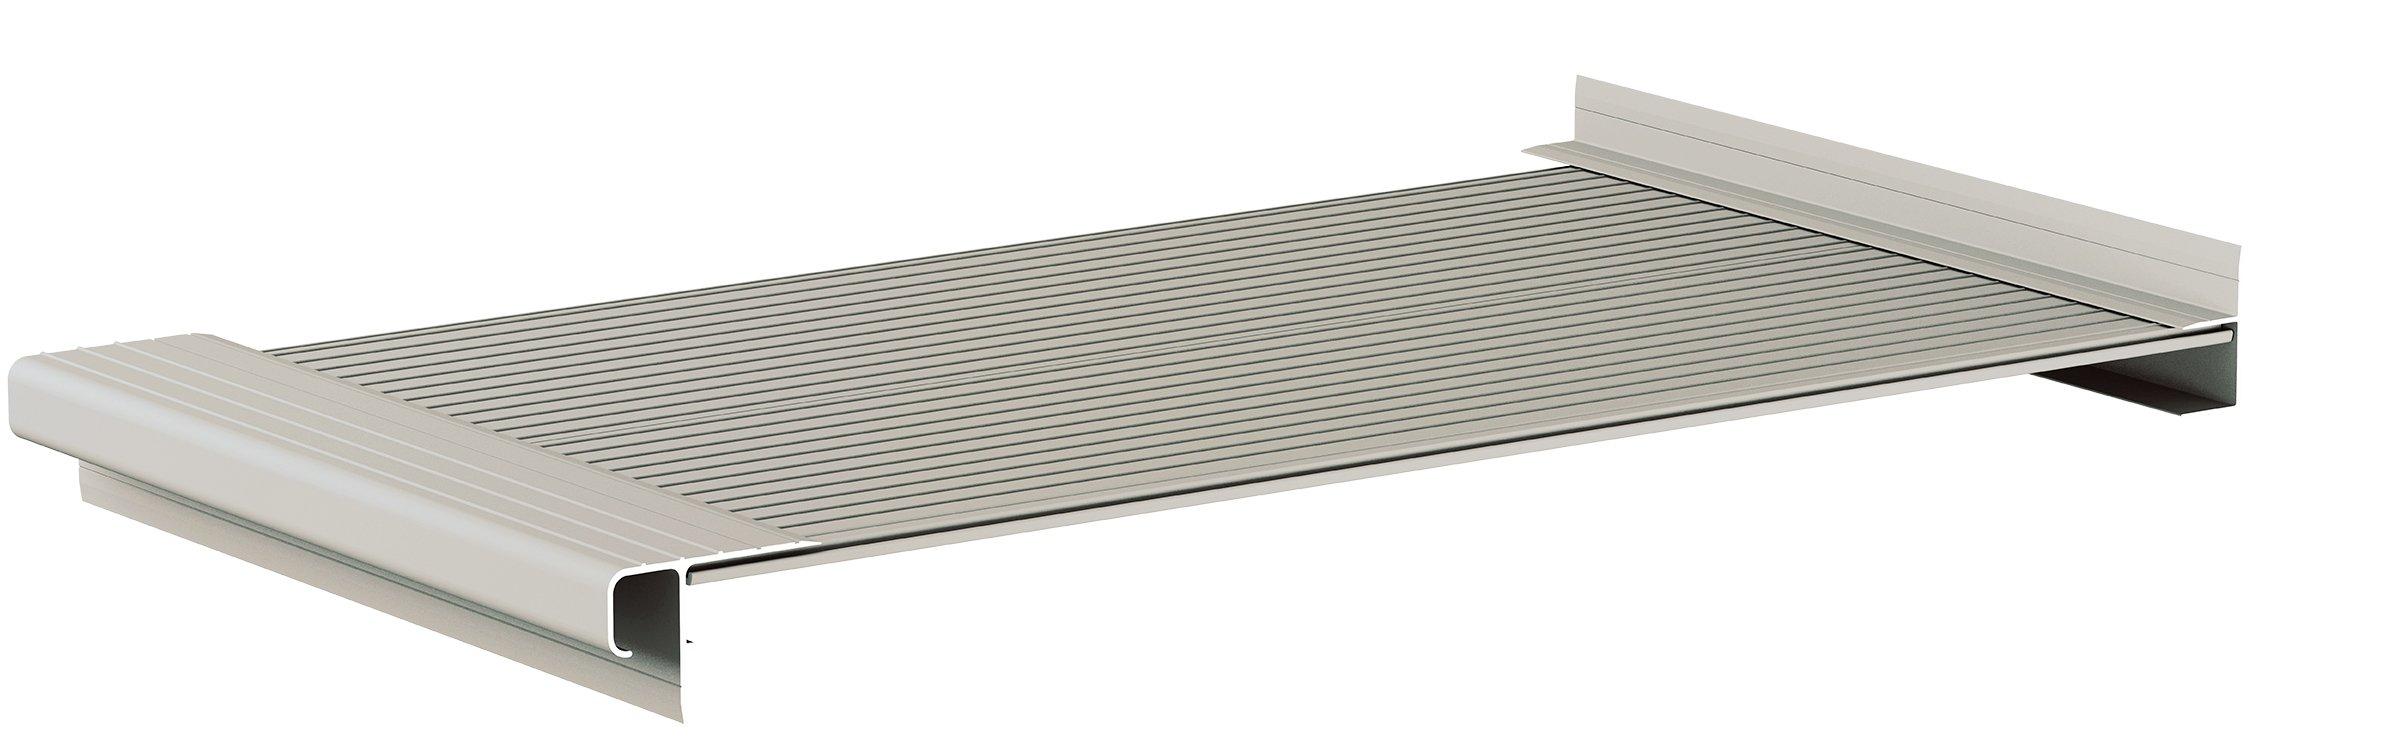 Aluminum Decking Board Profile-2